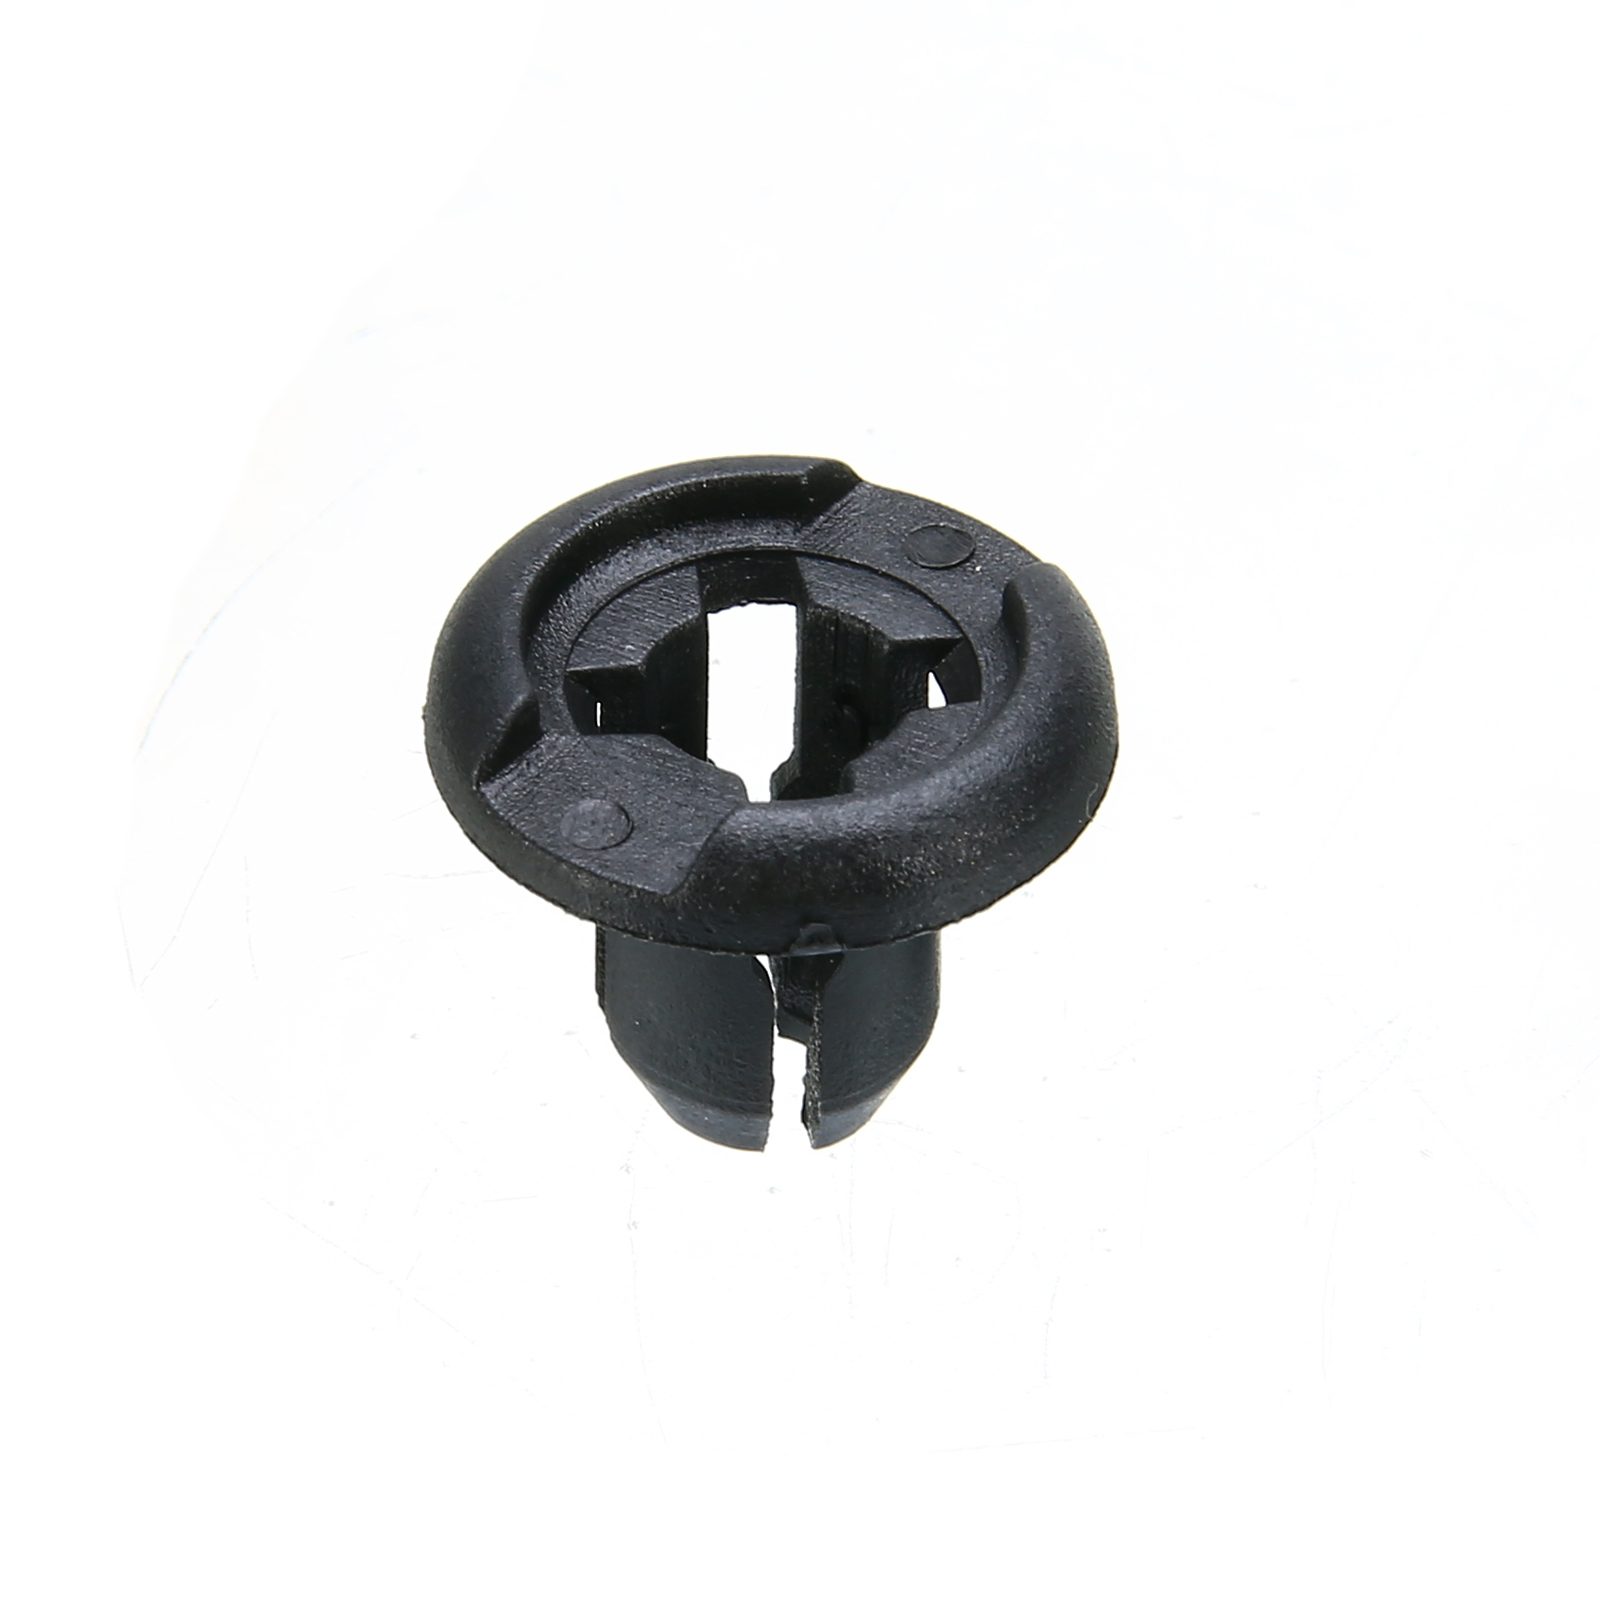 50Pcs/Lot 10mm Hole Car Plastic Rivet Bumper Fender Retainer Fastener Push Clips Pin Black Car Styling